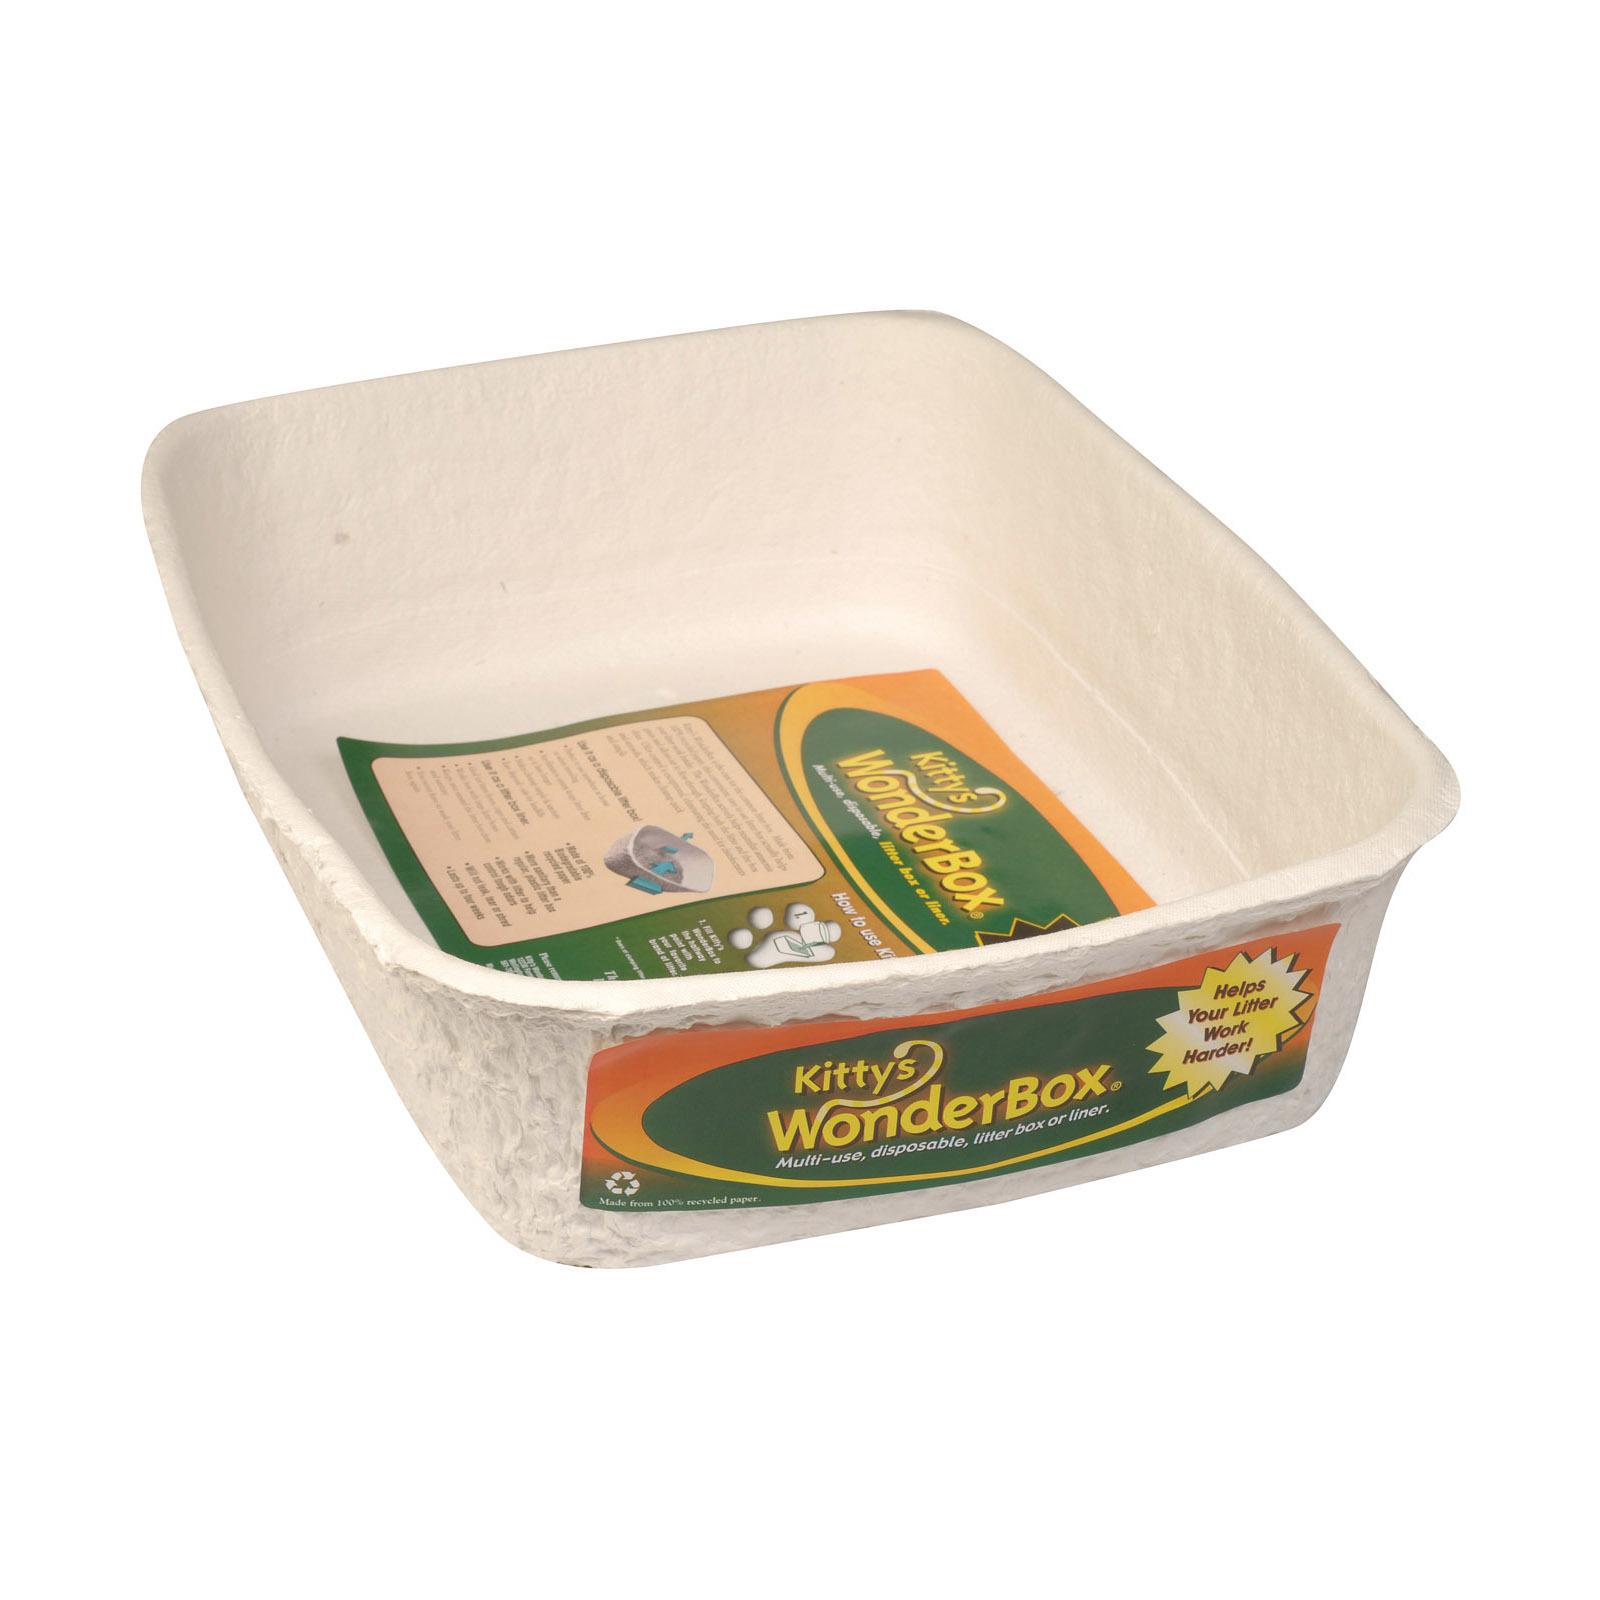 Wonder box Disposable Litter Box - Single - Case of 6